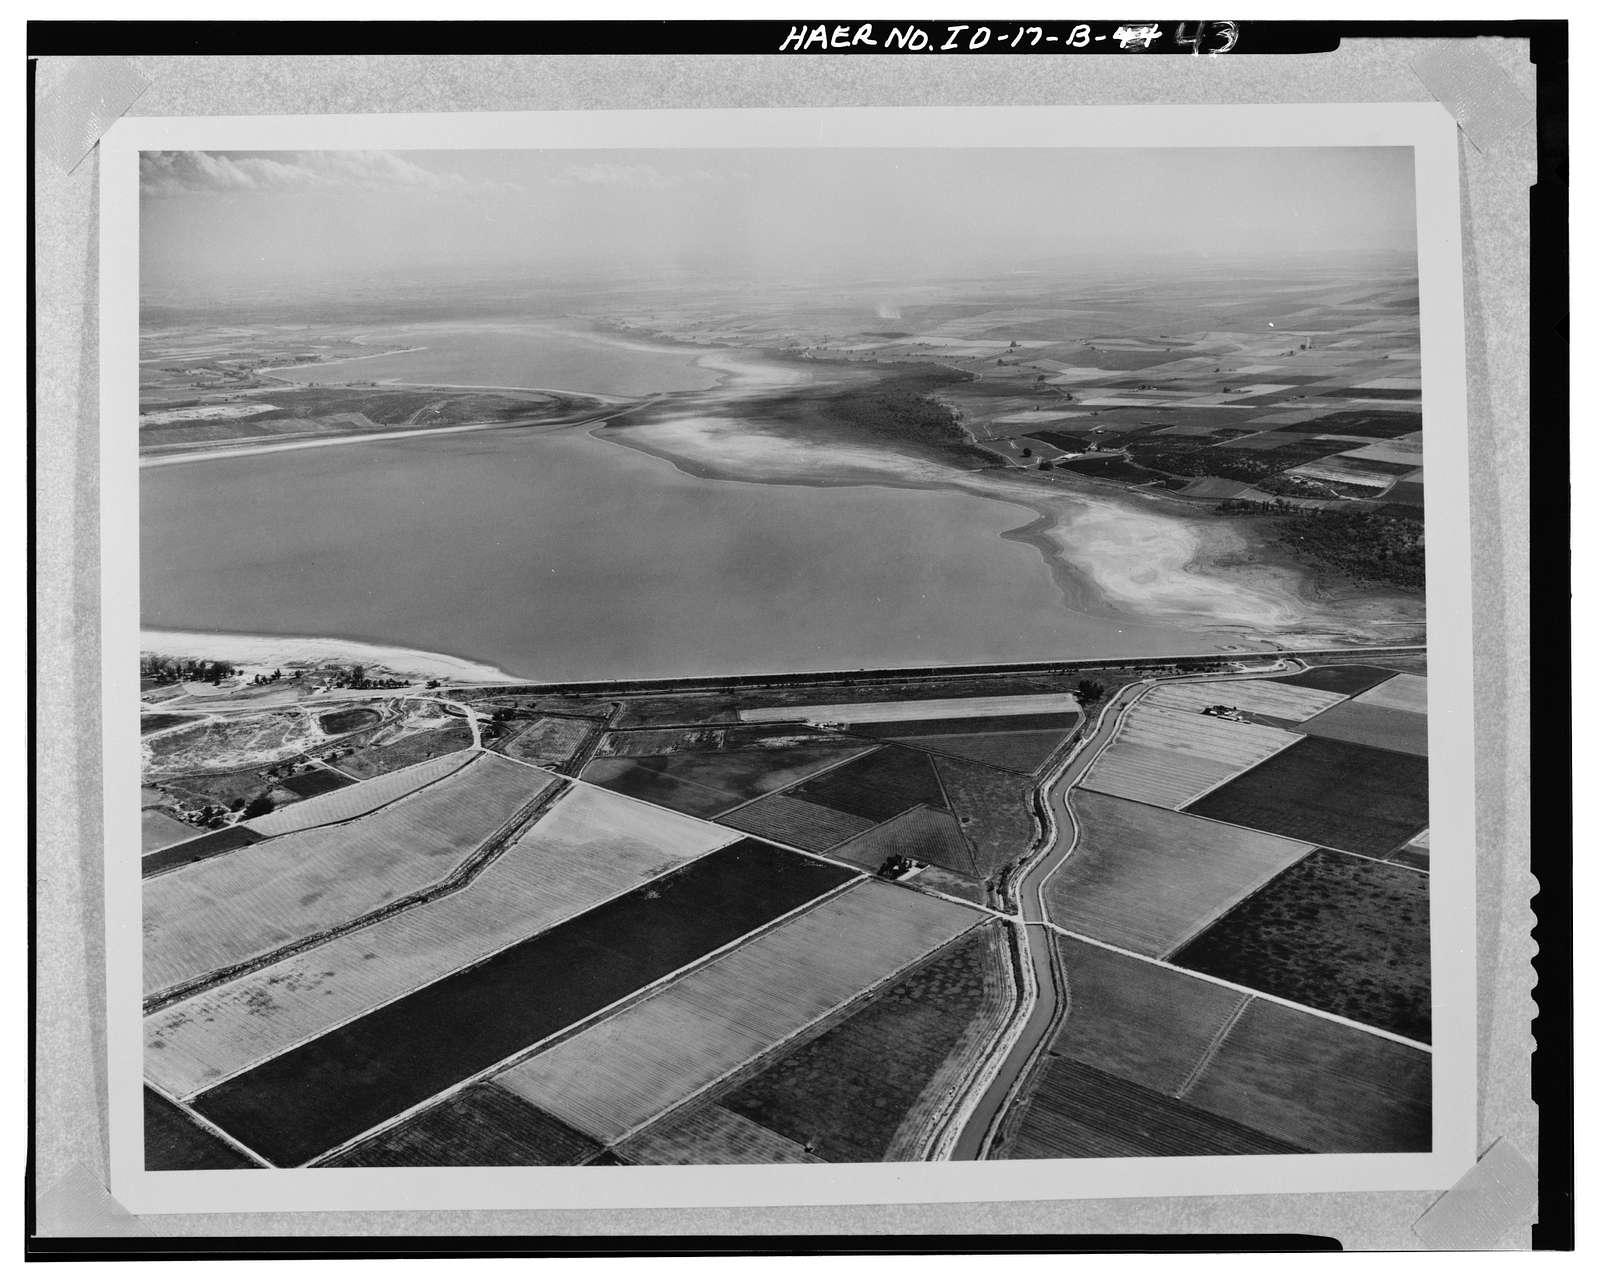 Boise Project, Deer Flat Embankments, Lake Lowell, Nampa, Canyon County, ID